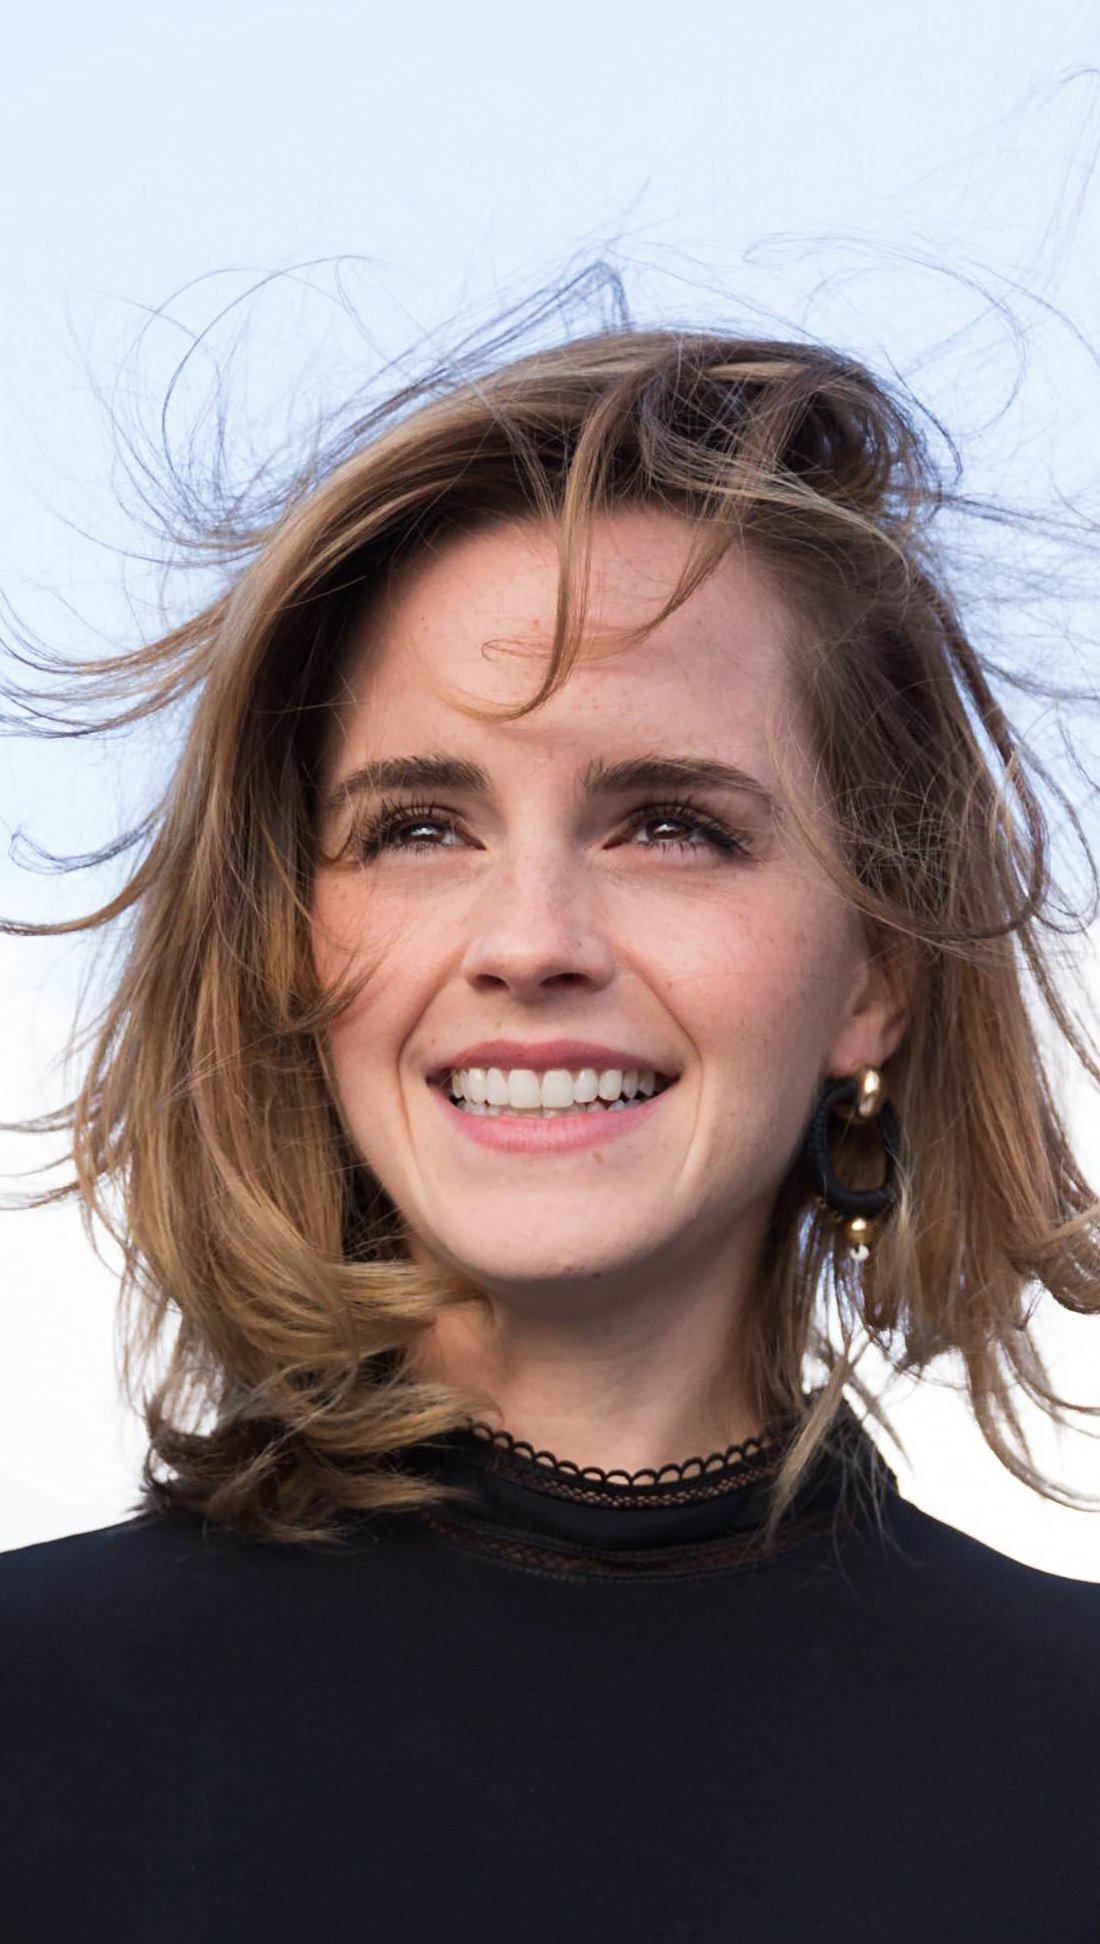 Fondos de pantalla Emma Watson Vertical